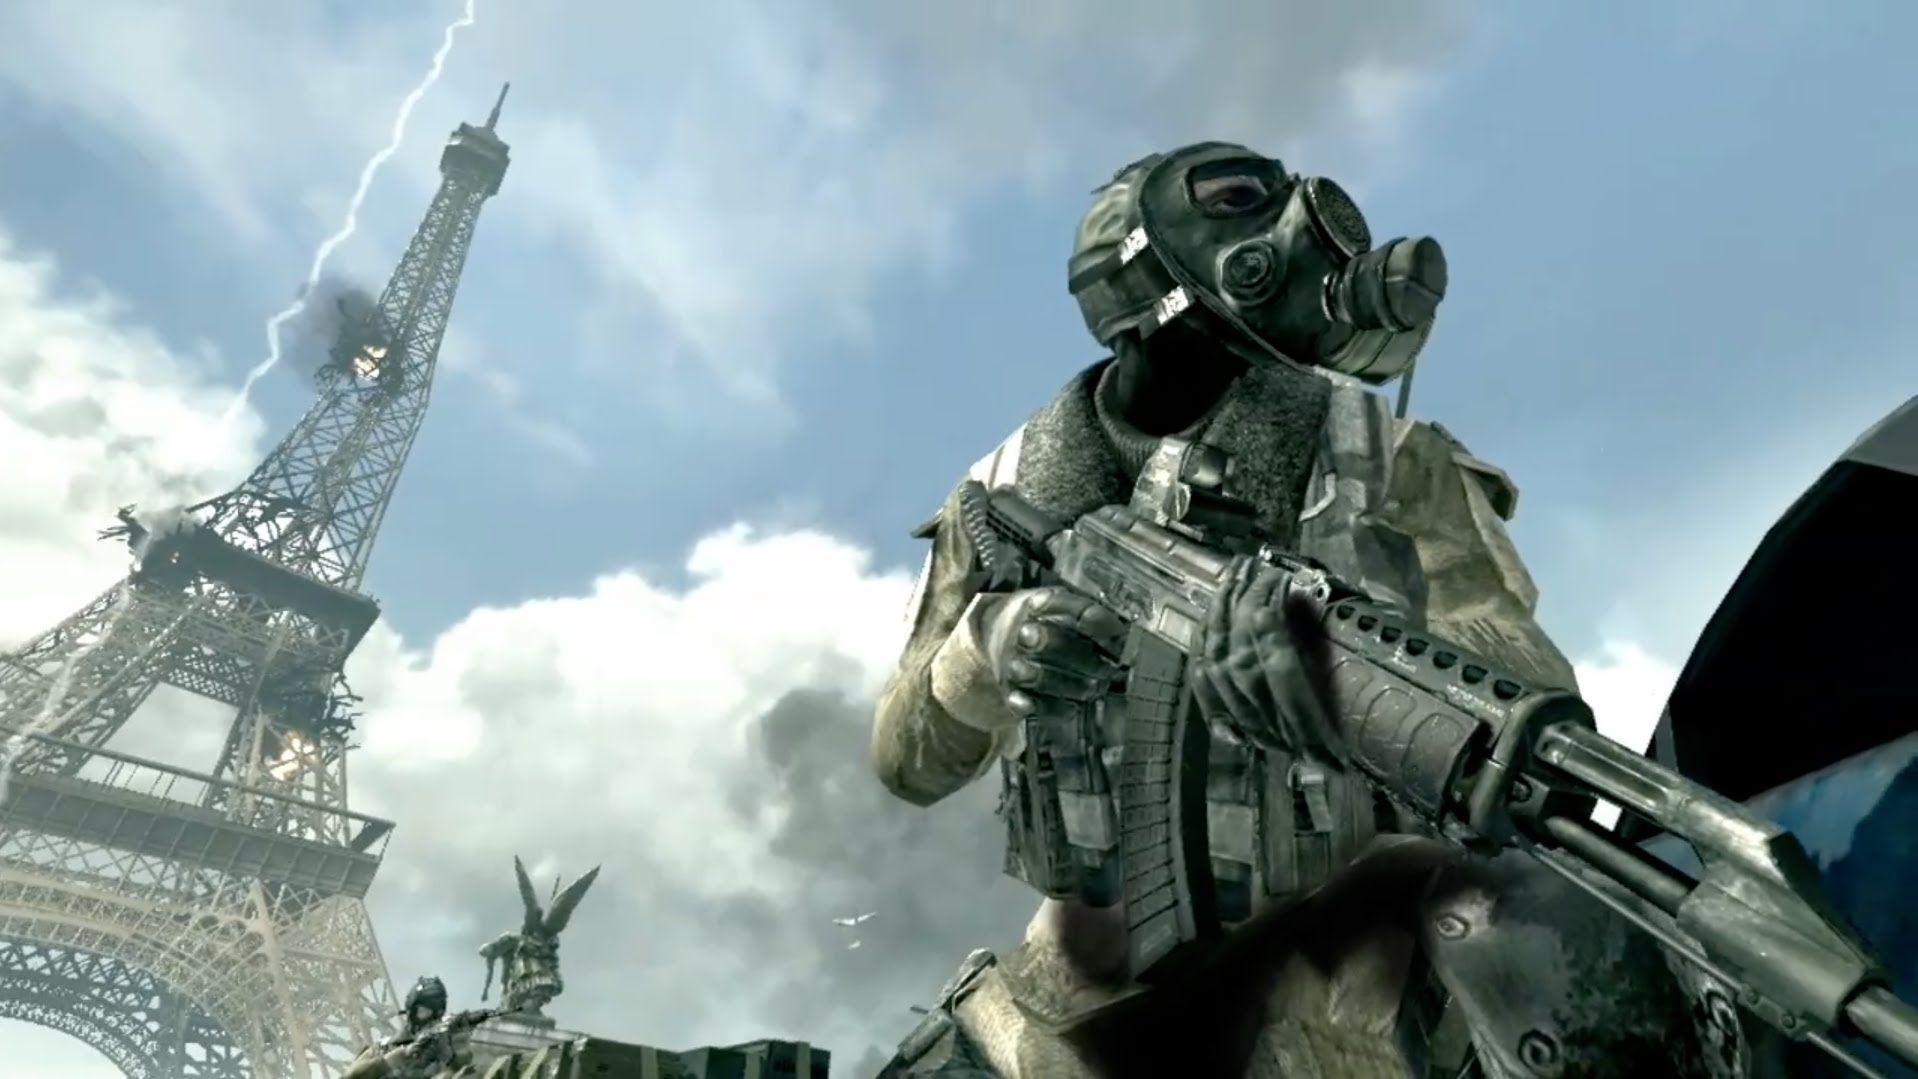 Official Call Of Duty Modern Warfare 3 Launch Trailer Call Of Duty Modern Warfare Advanced Warfare